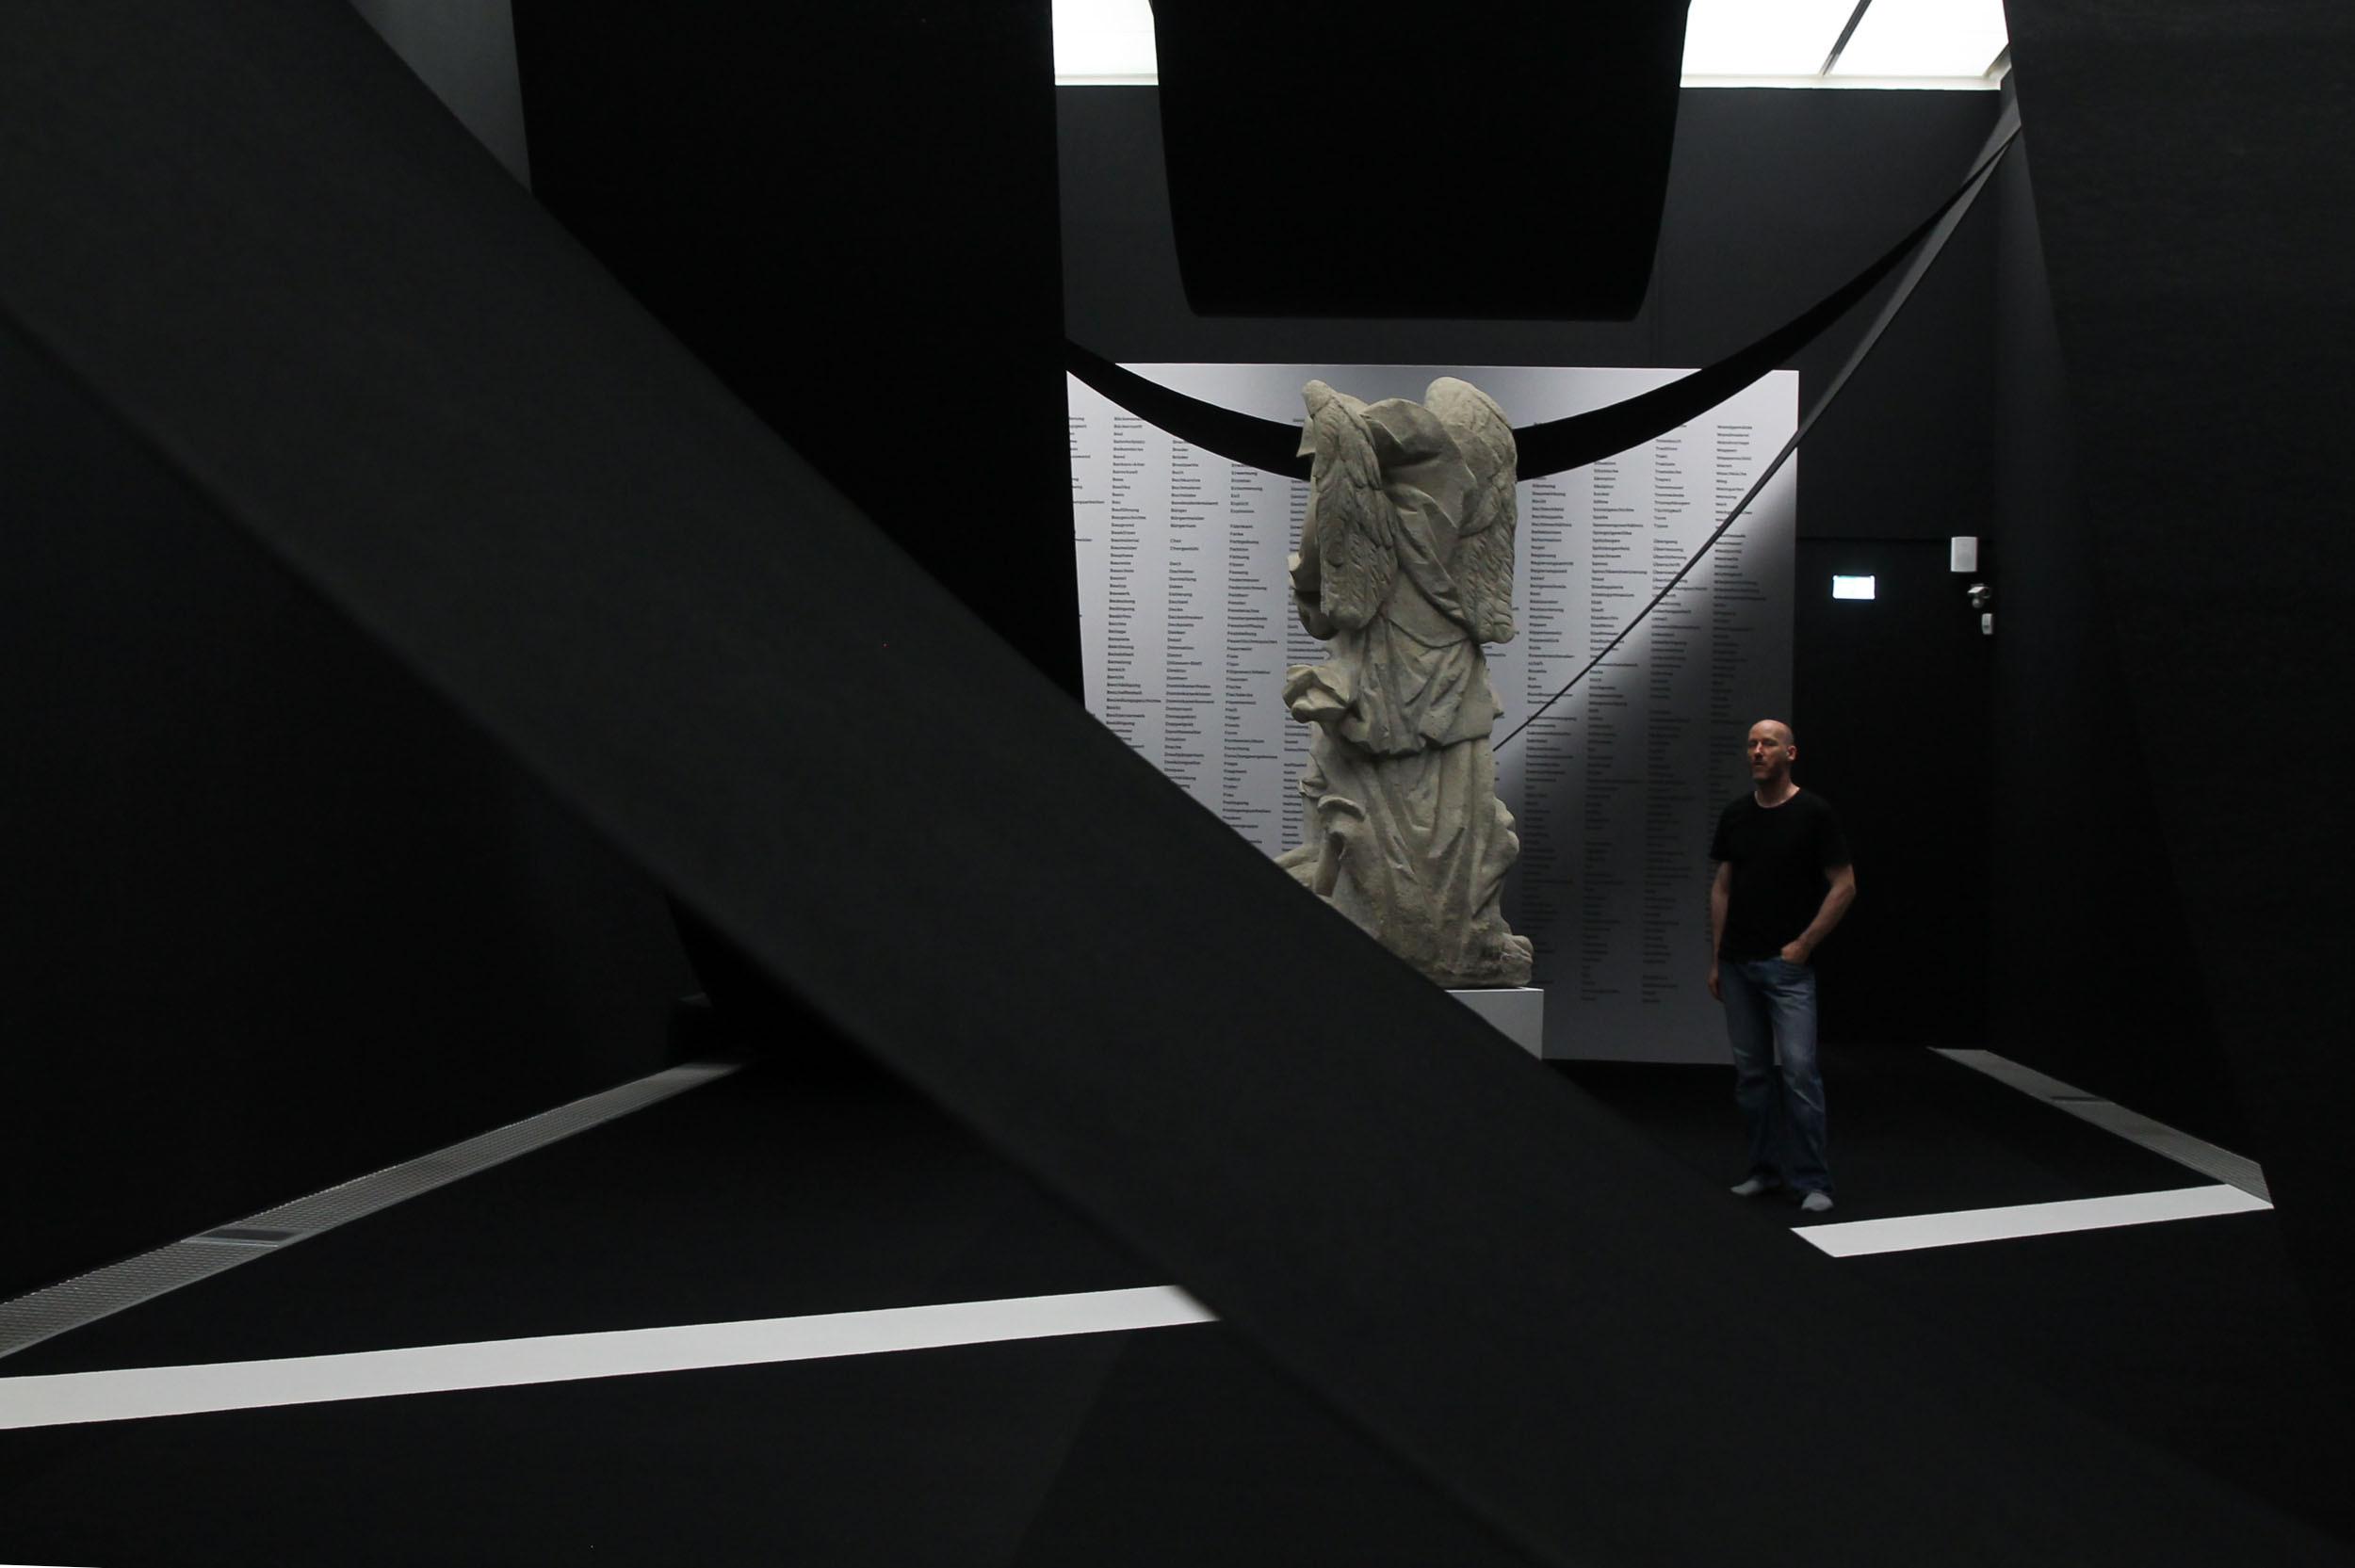 eSeL Foto: Christian Helwing - (B)East! (Kunsthalle Krems, 17.7.-1.11.2021)